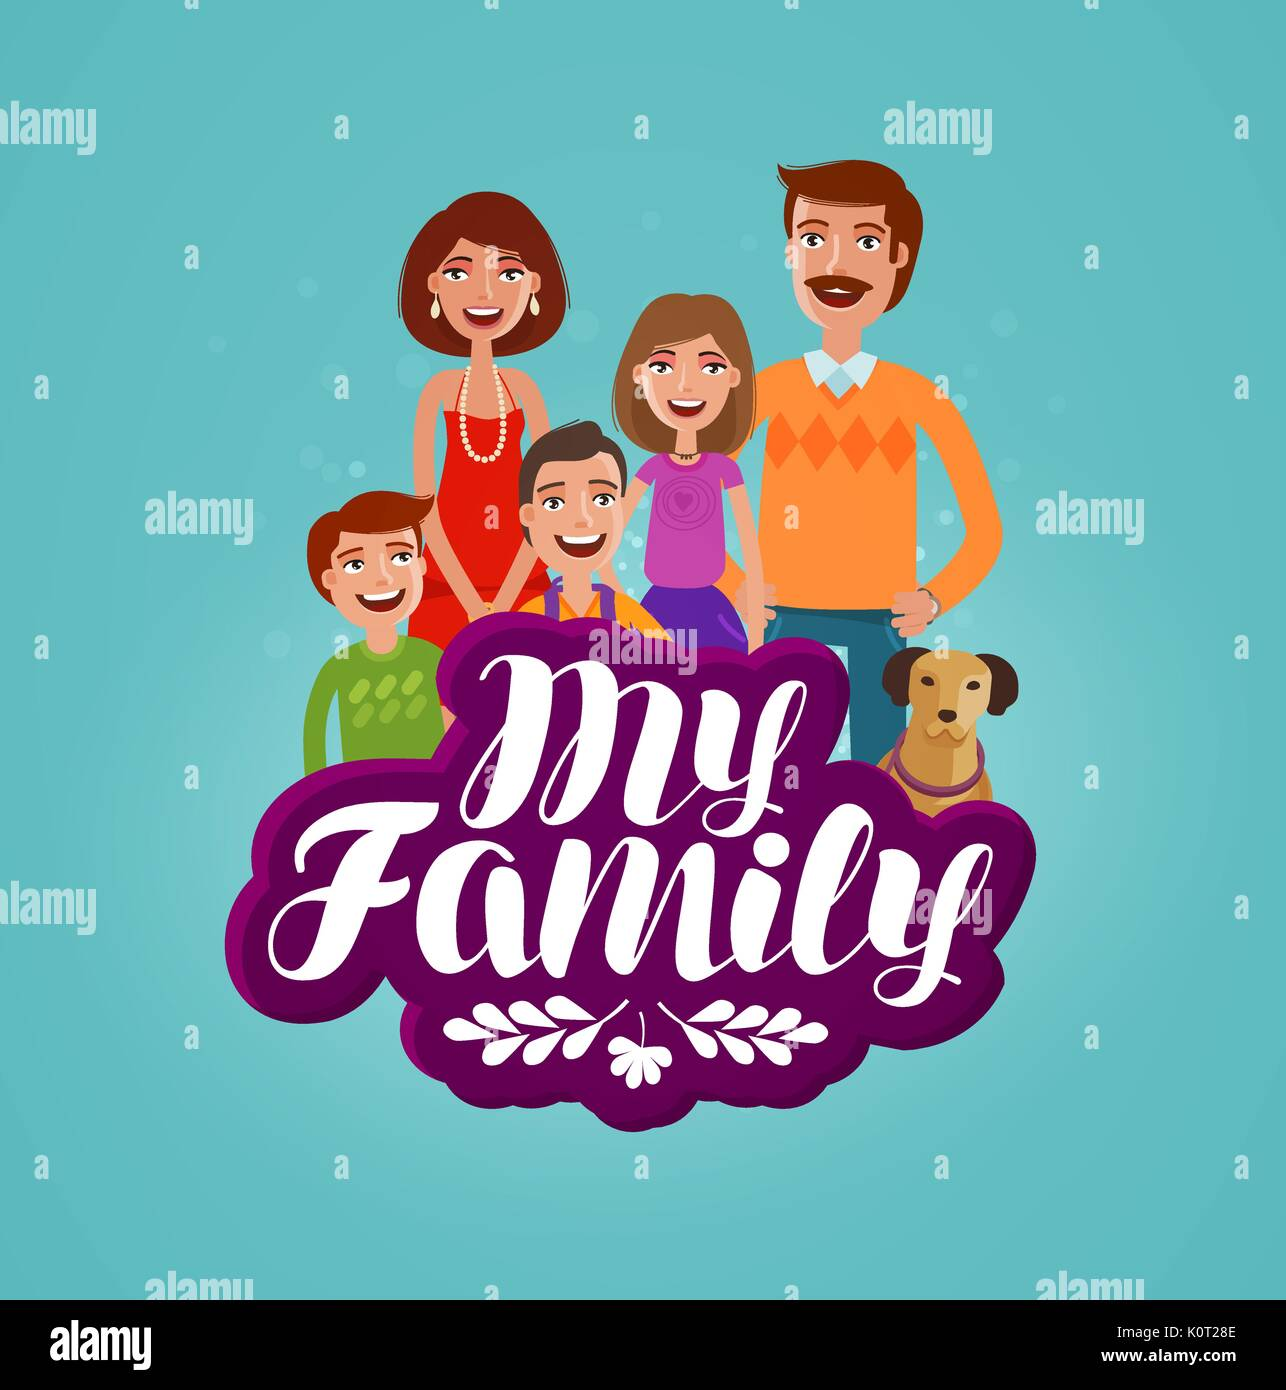 Happy Family Concept Domestic Life Cartoon Vector Illustration Stock Vector Image Art Alamy